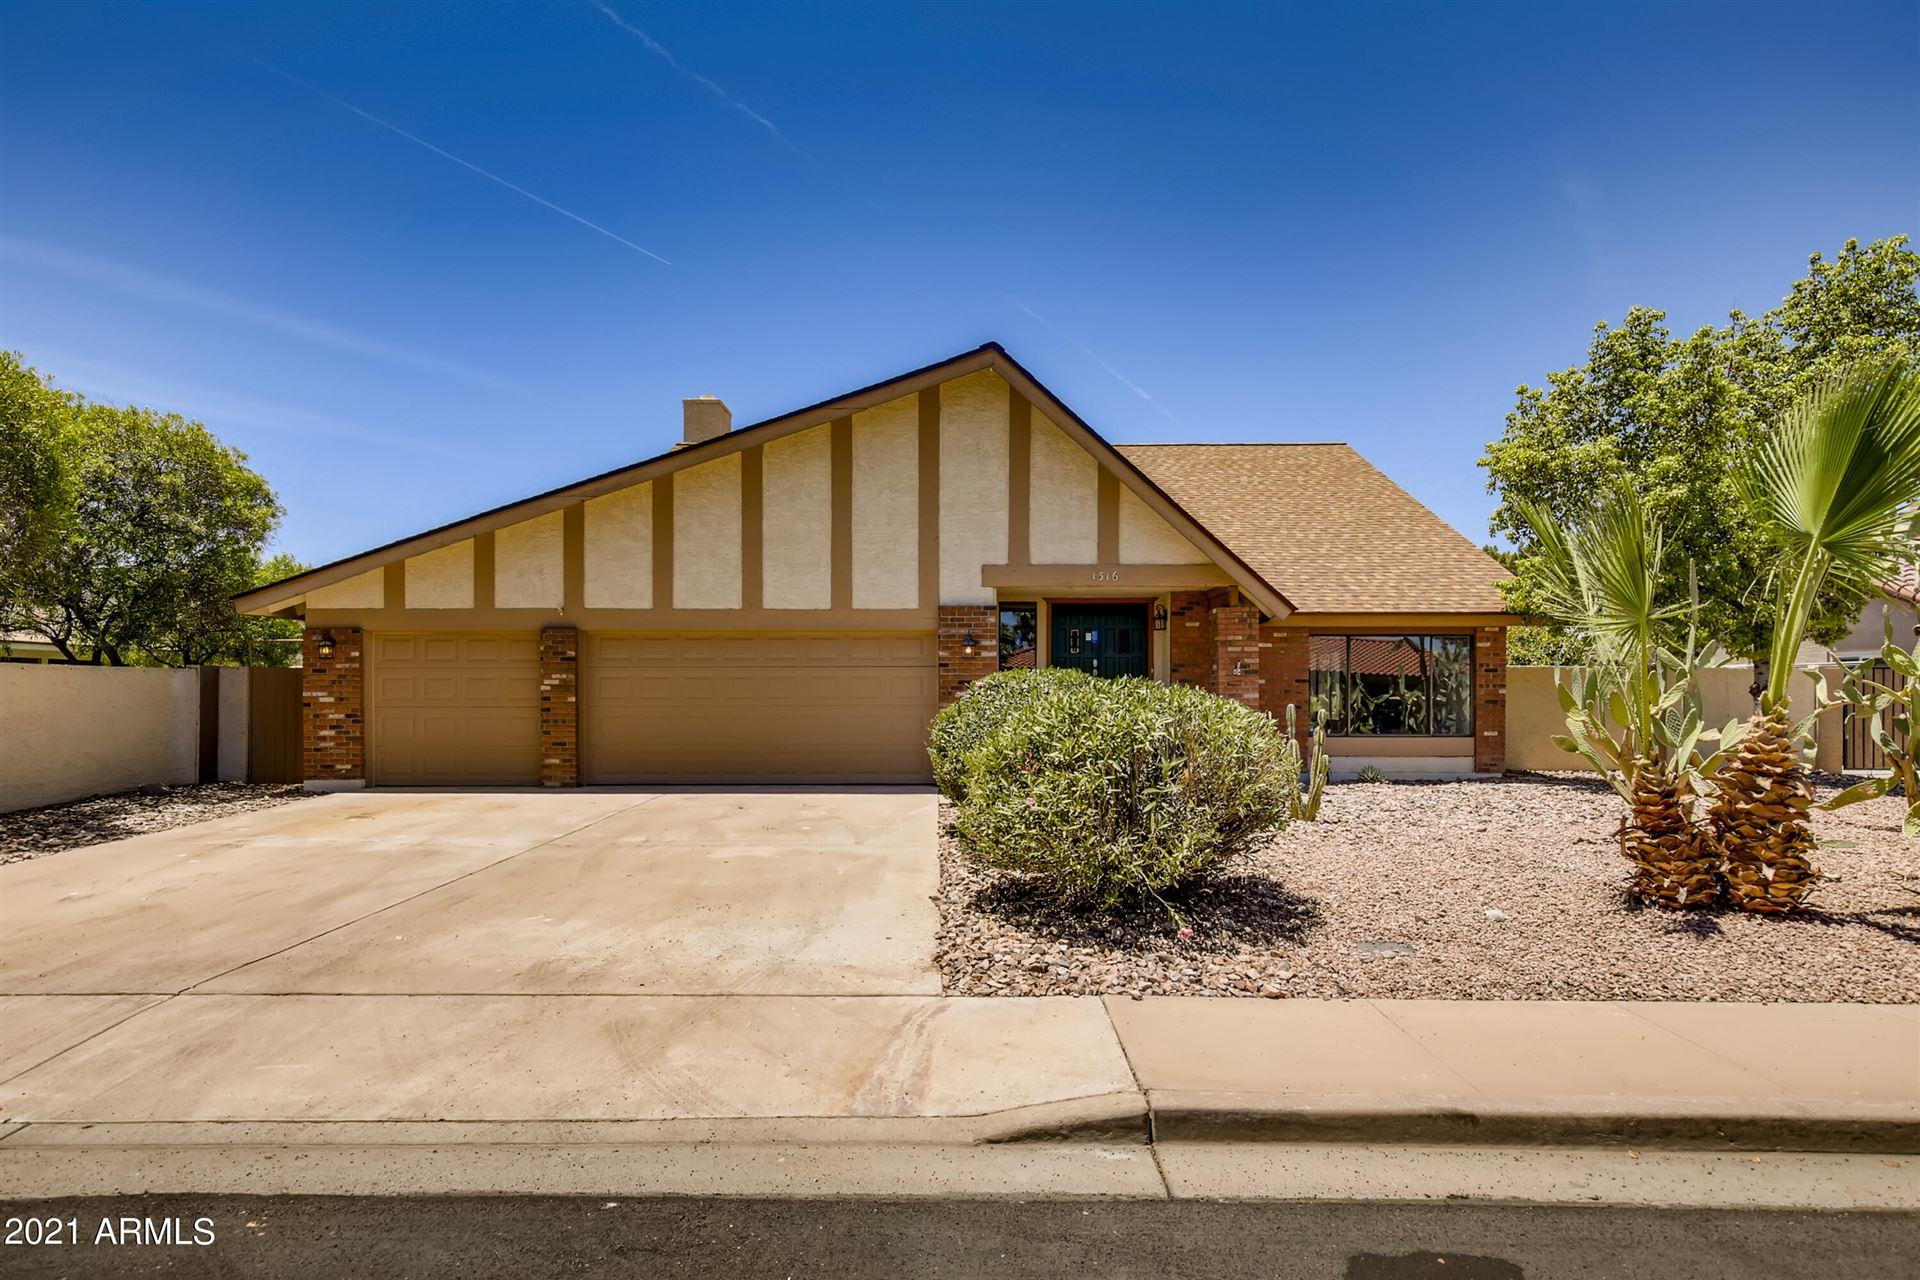 Photo of 1316 N WILBUR --, Mesa, AZ 85201 (MLS # 6249939)